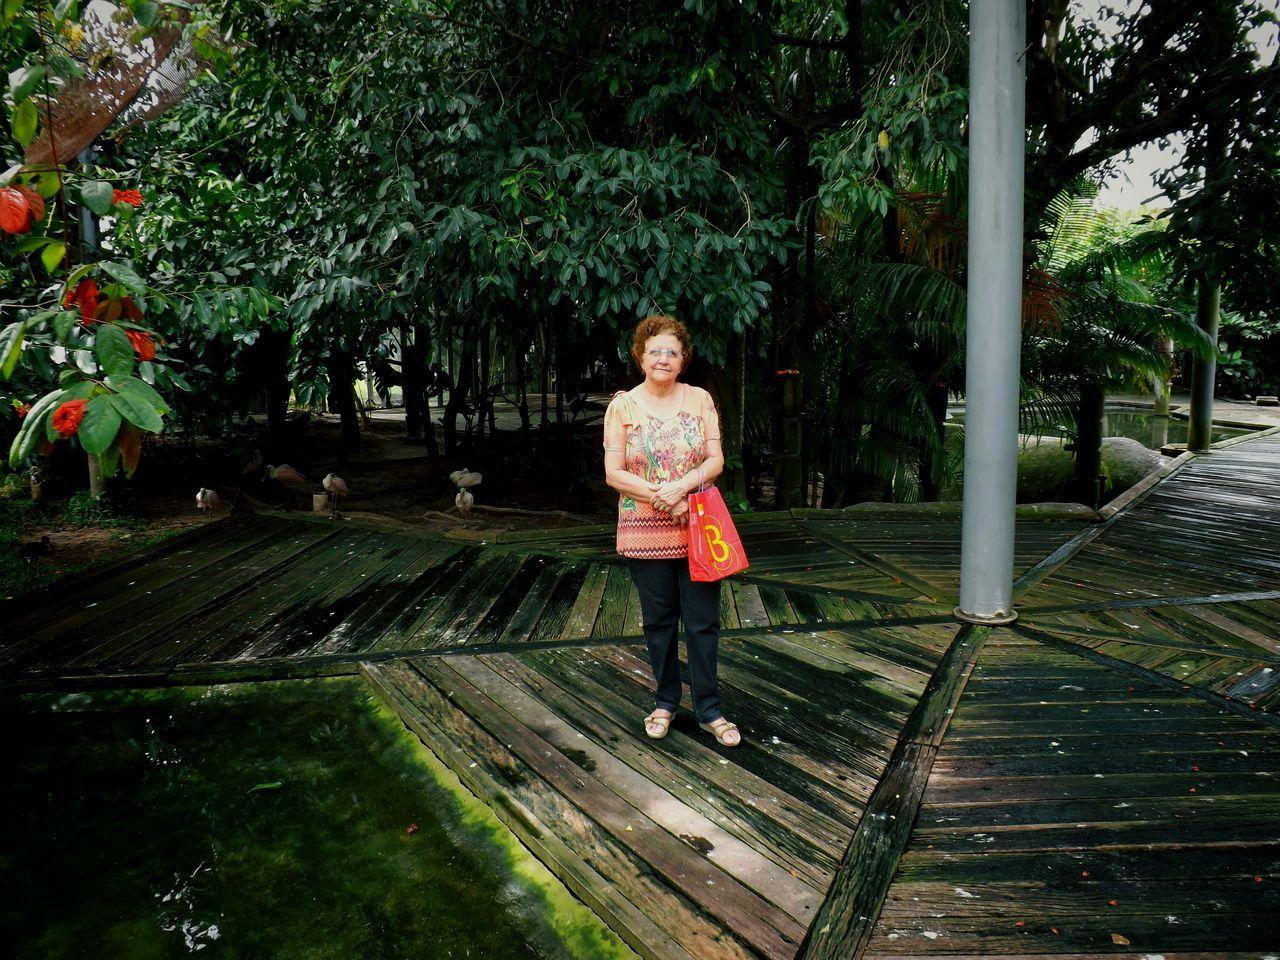 Natural Light Portrait Abuela Grandma Nona Vovo Belem-Pa-Brazil Mangal Garças Aviario Guara